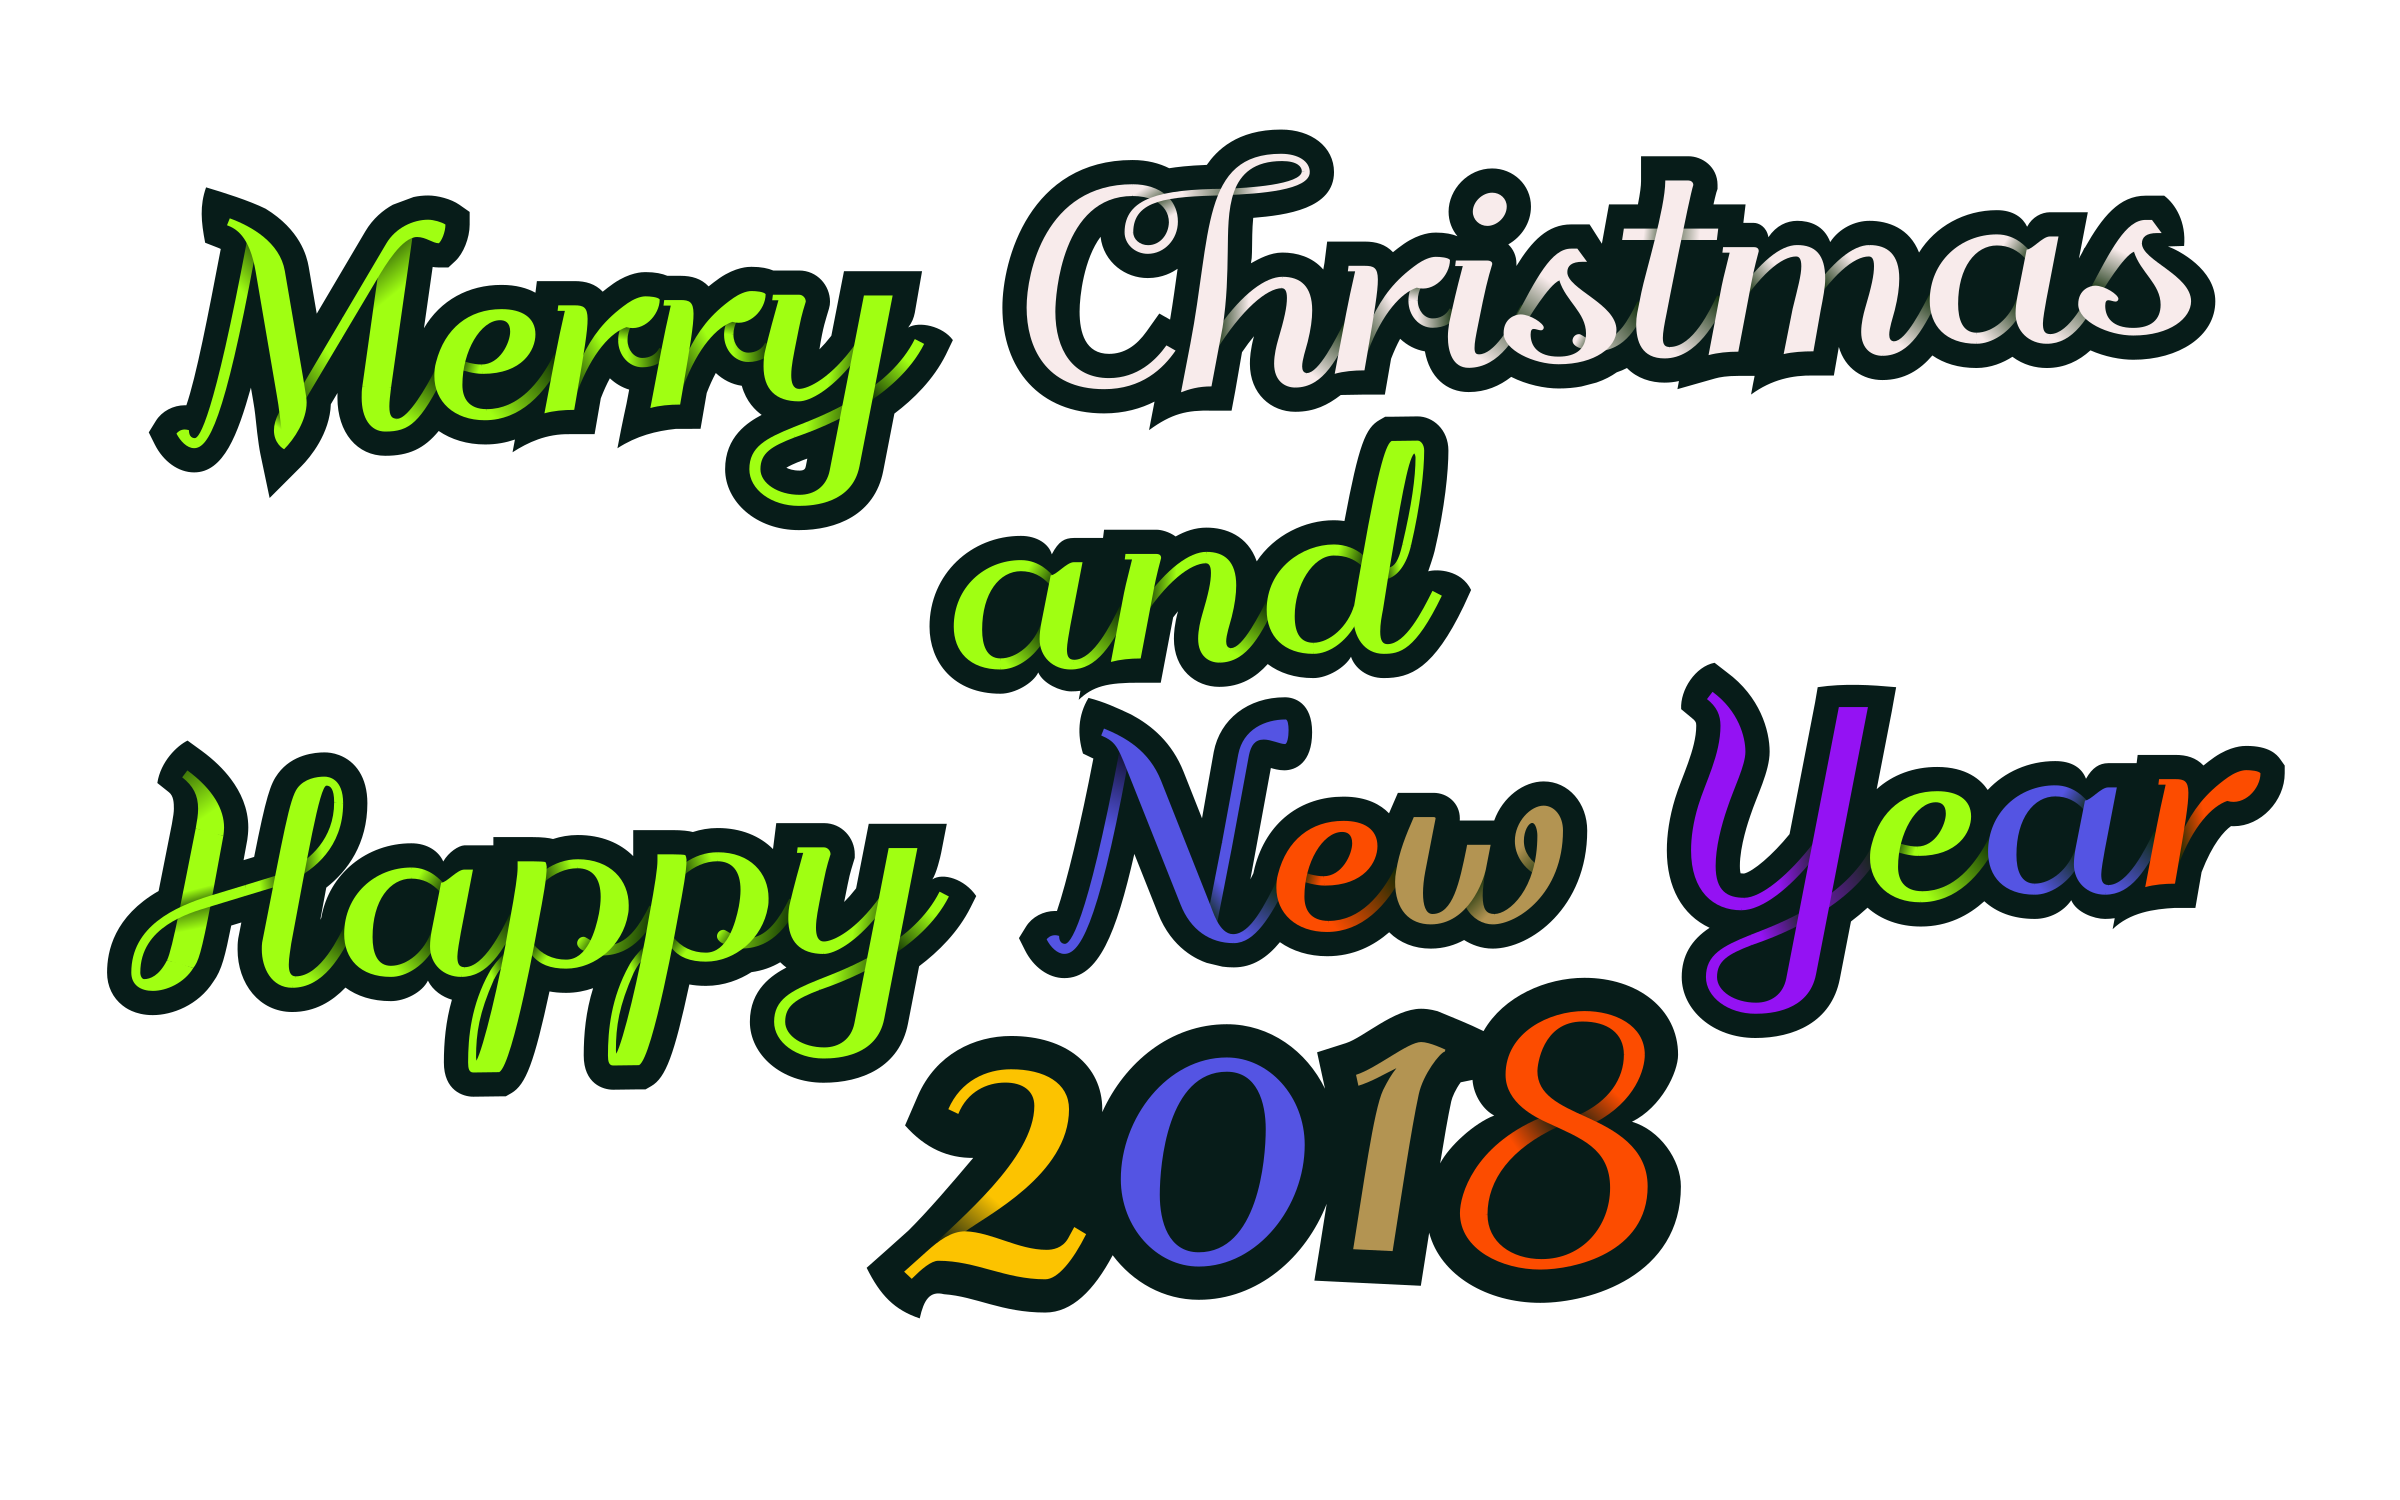 Logo clipart christmas. Merry happy new year